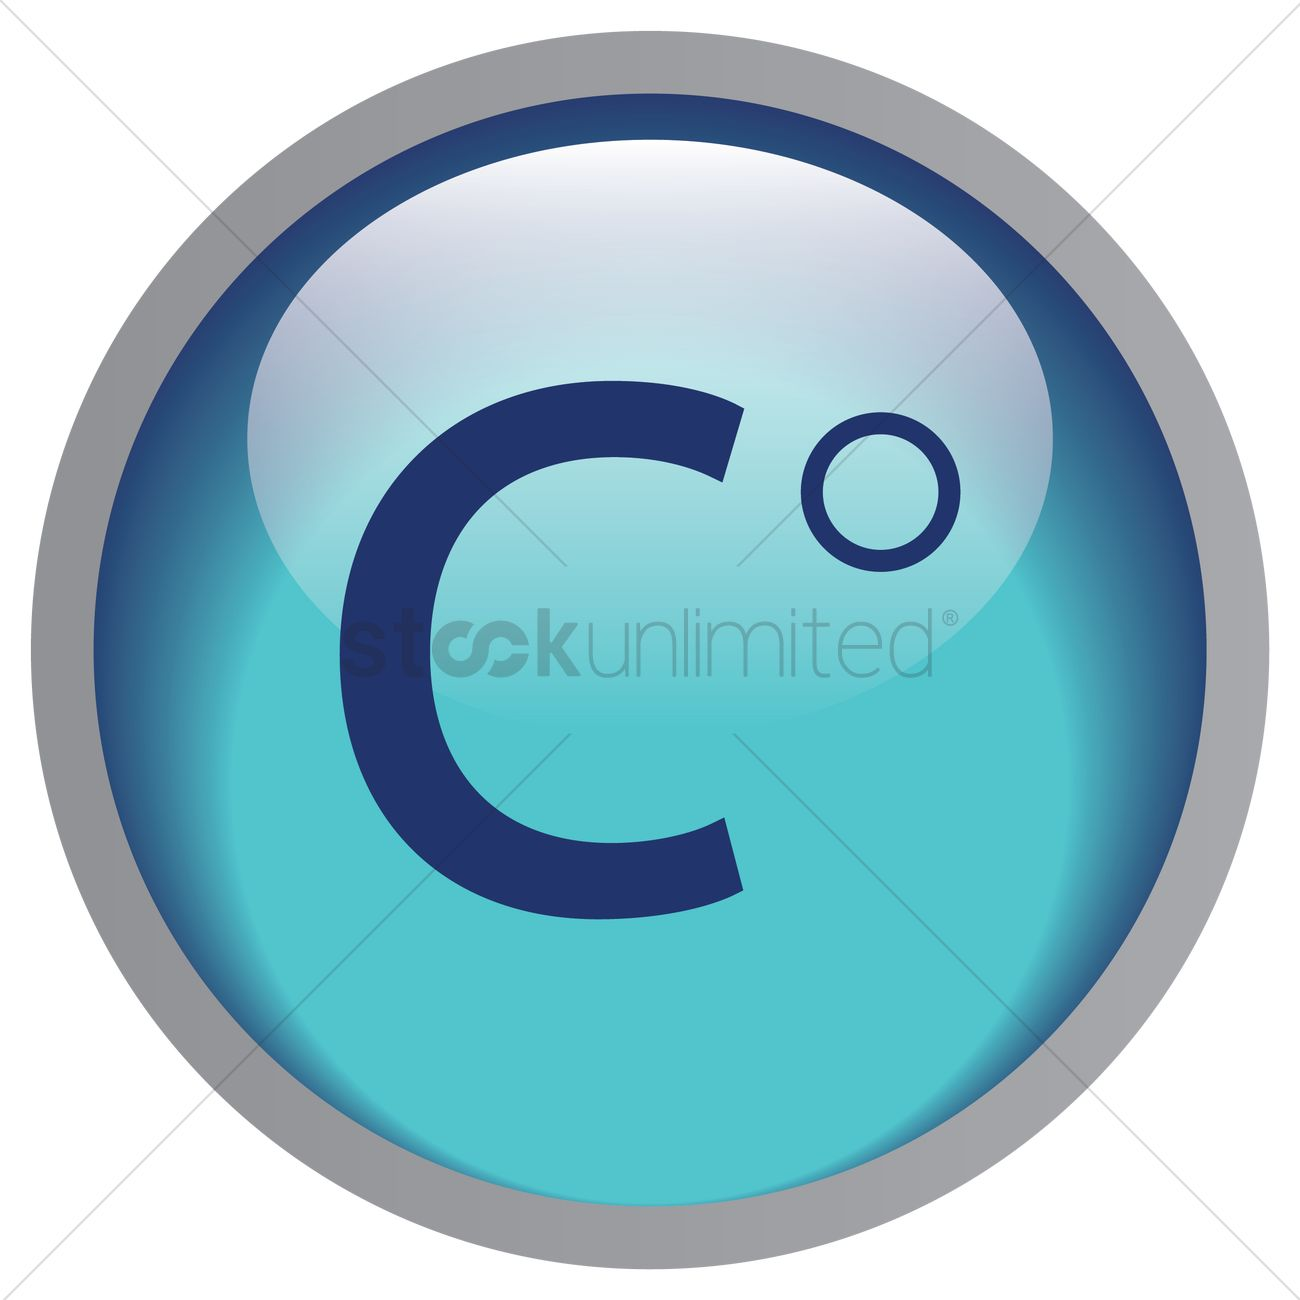 Celsius Degree Degrees Symbol Symbols Temperature Temperatures